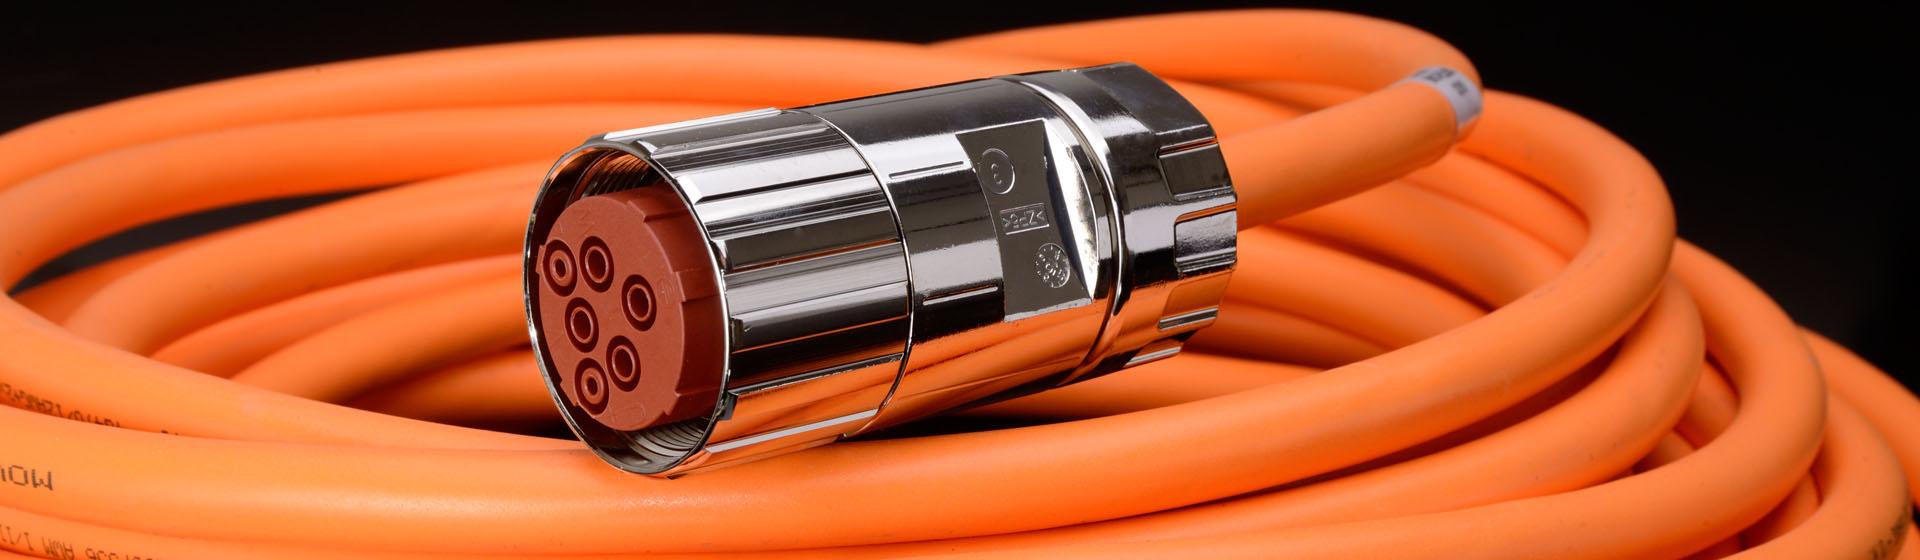 BNC+Elbis-slide_0006_cavo-automazione-arancio